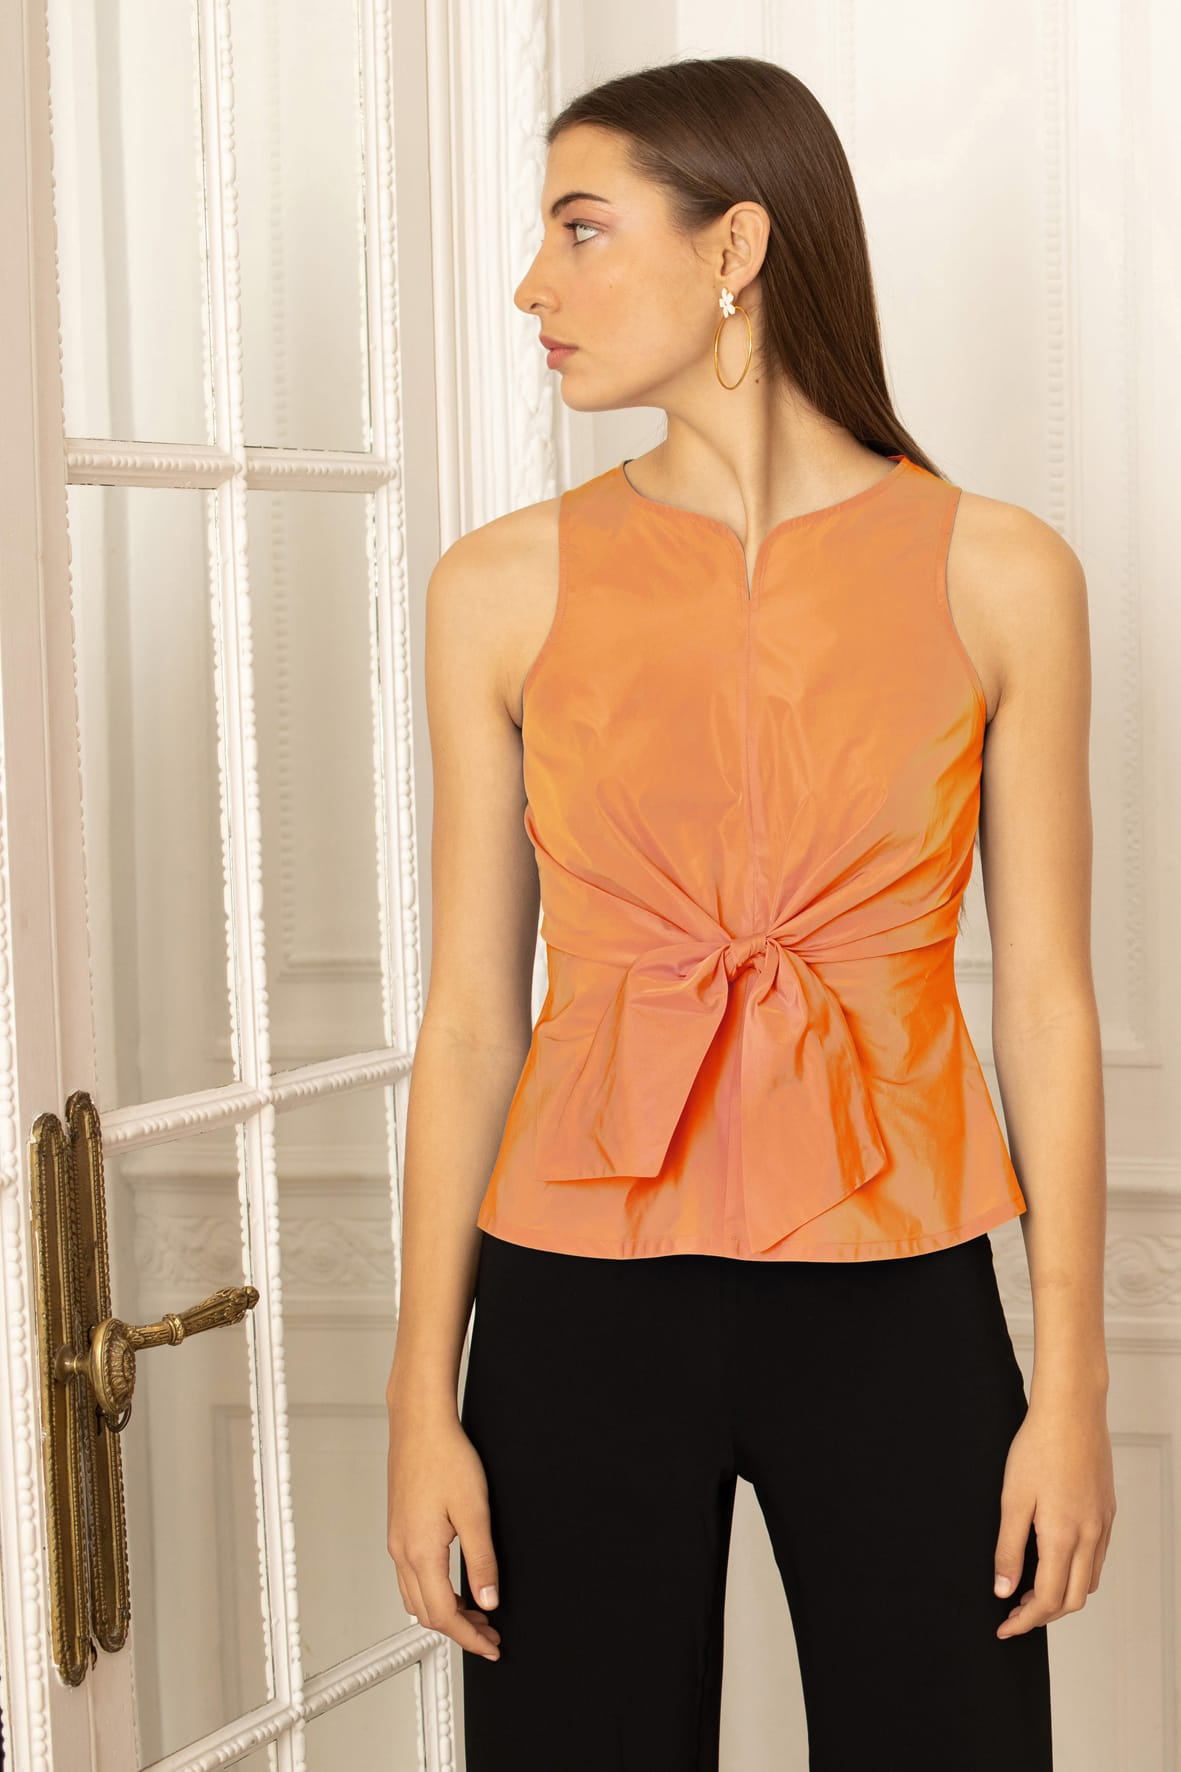 diseñadora-de-moda-Lady Top